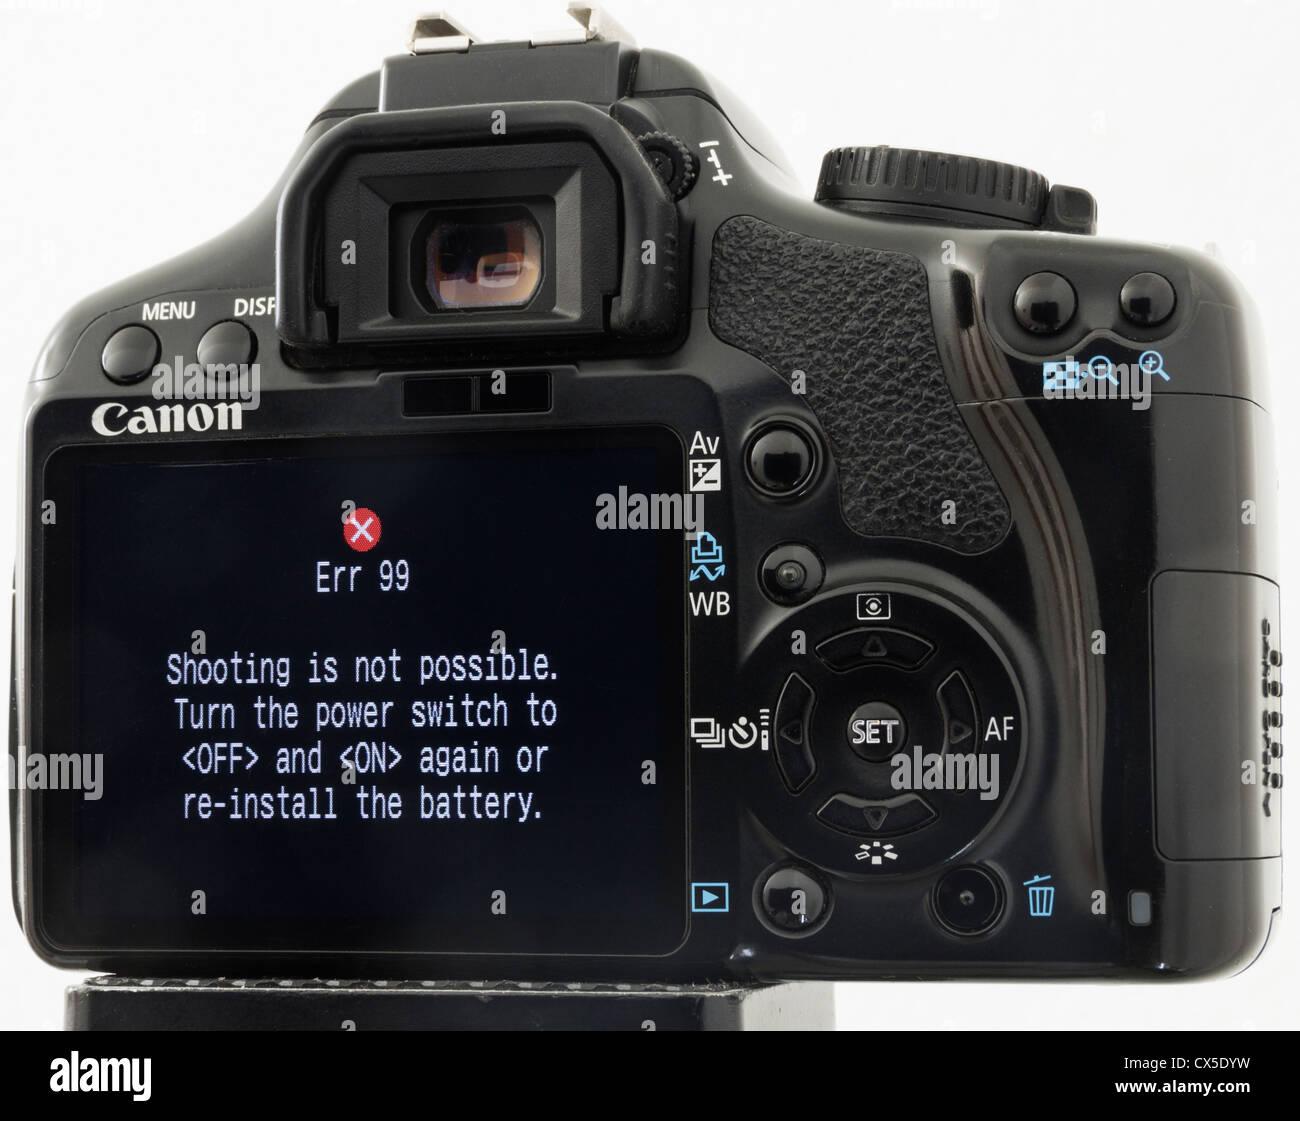 99 Fehlermeldung auf LCD-Bildschirm auf Canon 450 D Digitalkamera. Stockbild